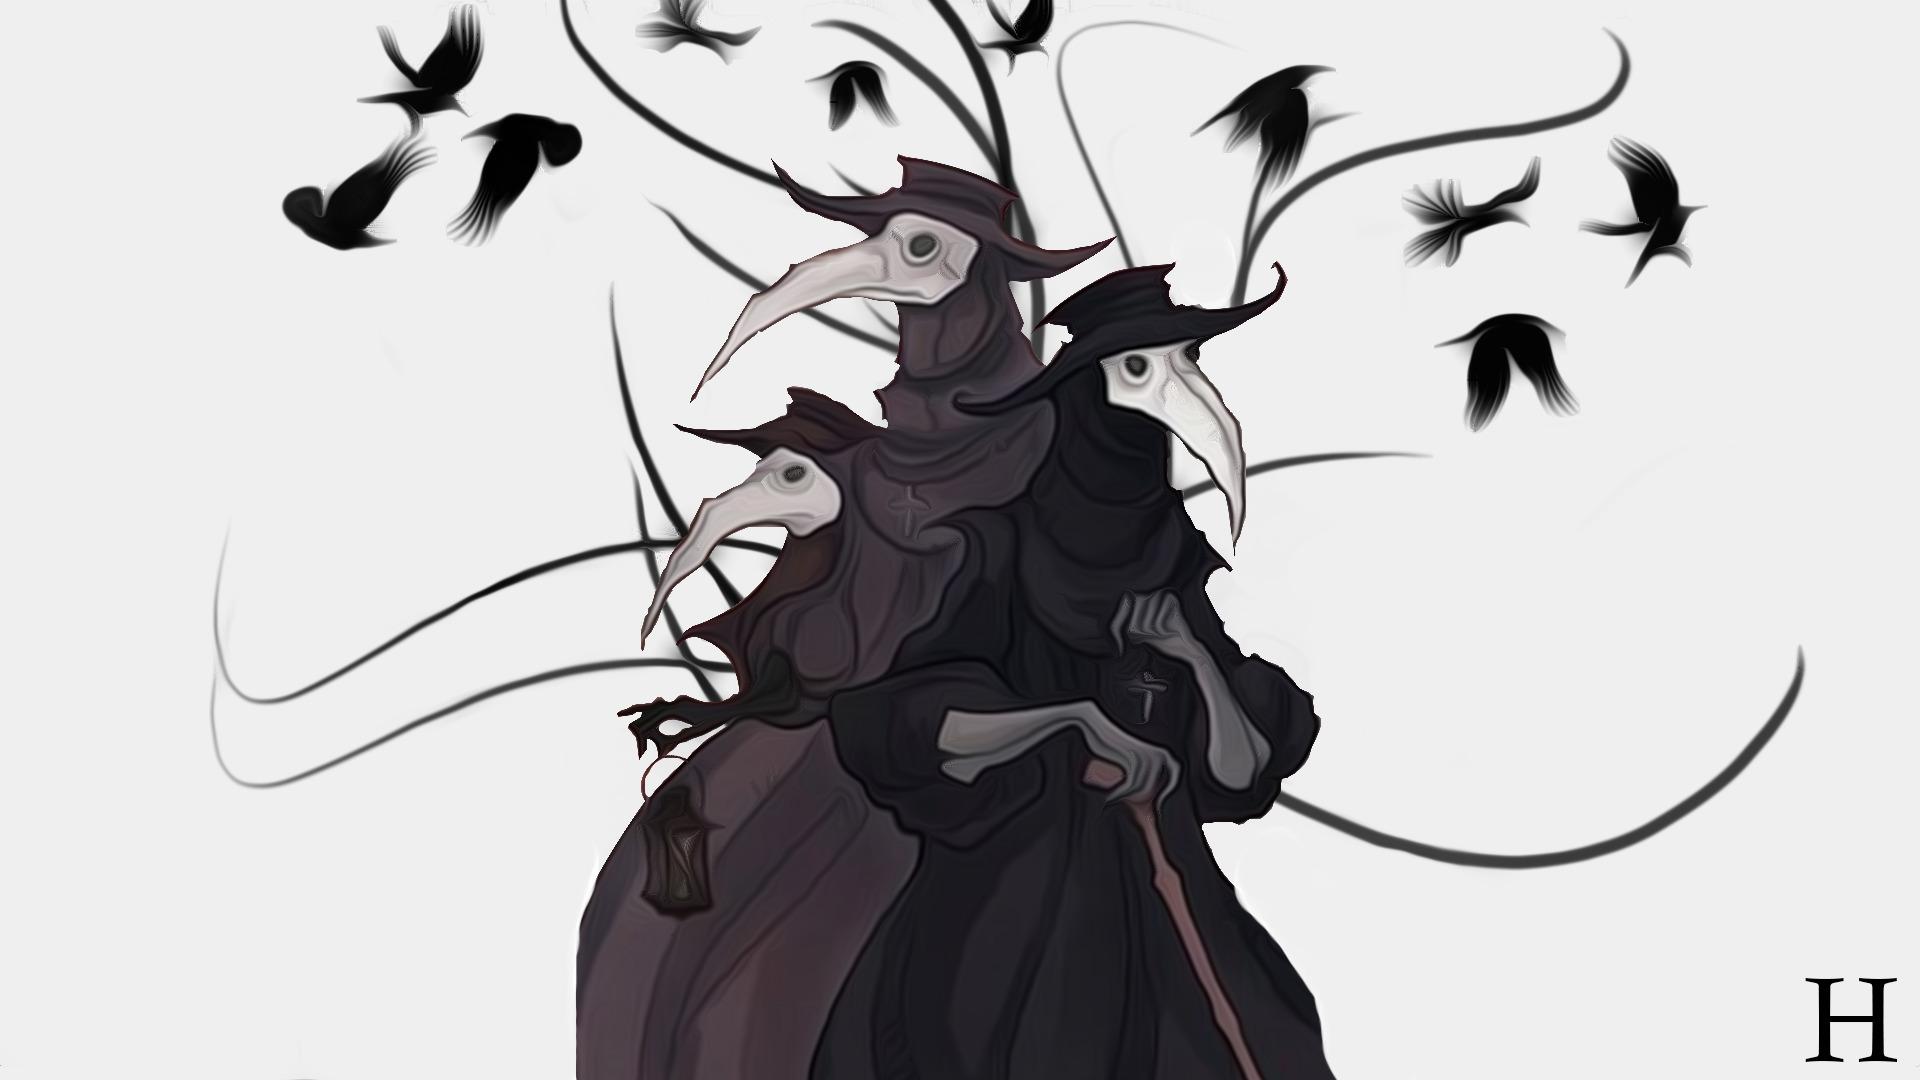 1c65e385b7cbb 1920x1080 px crow dark doctors fantasy art Plague plague doctors raven The  Crow the Darkness